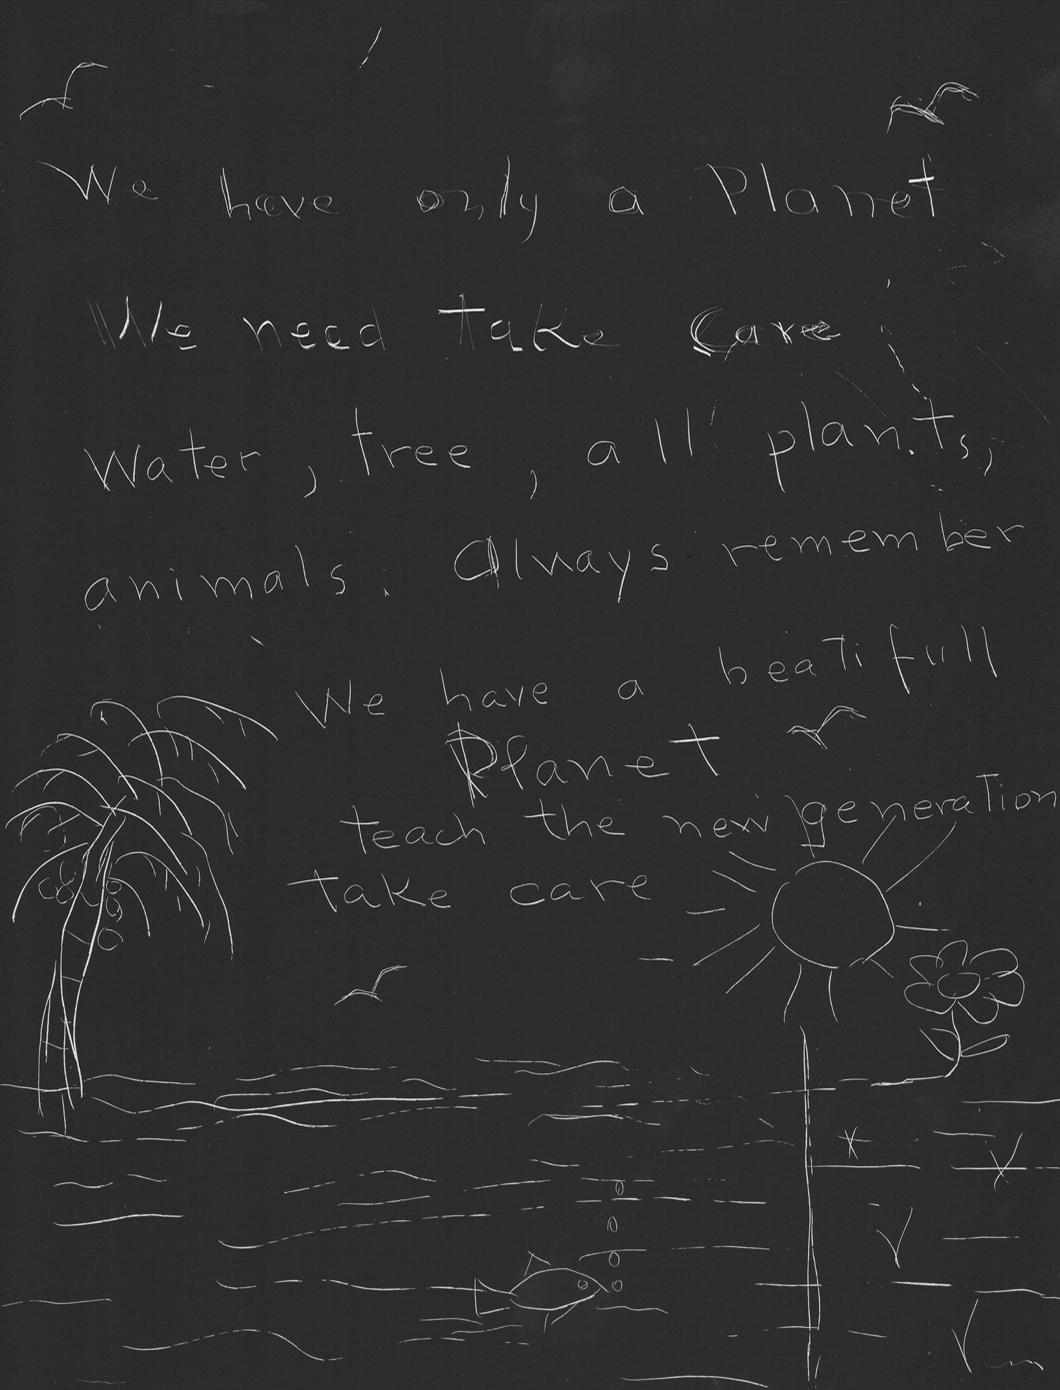 we need to take care.jpg